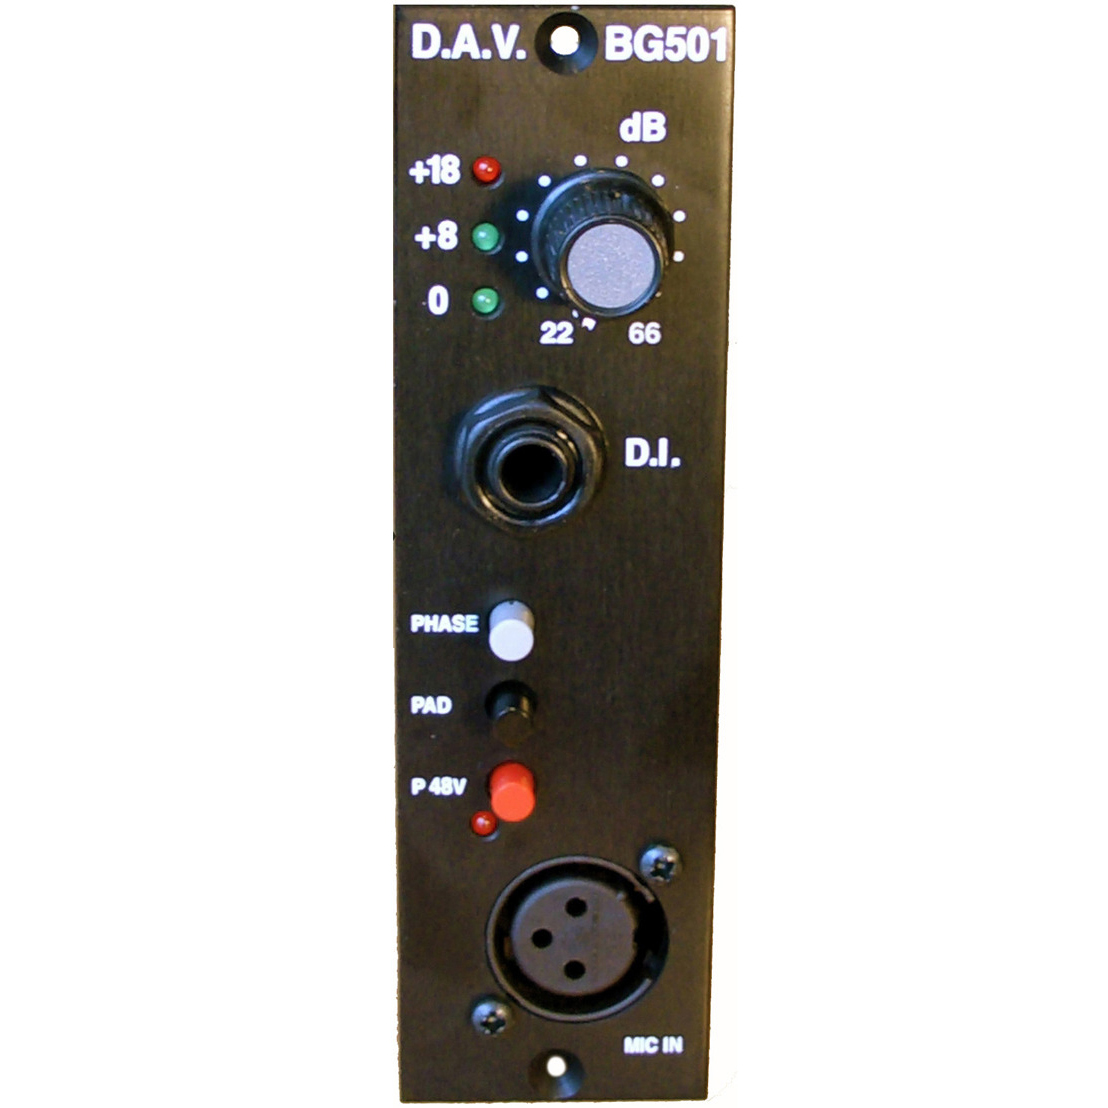 DAV Electronics Broadhurst Gardens 501